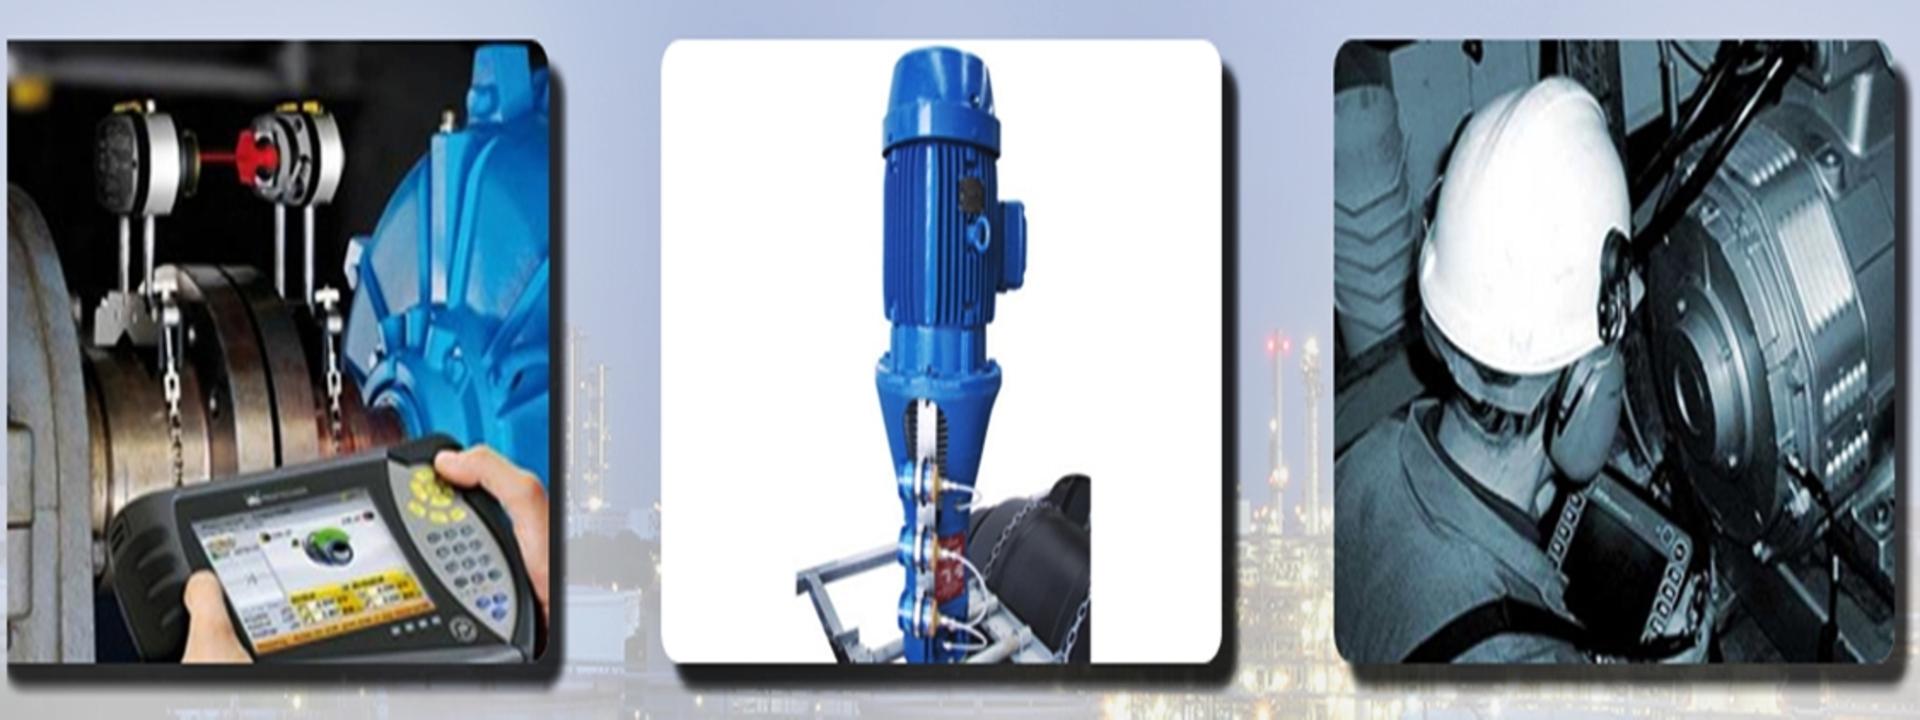 Te Teras Tech Electrical Works Sdn Bhd Electric Motors